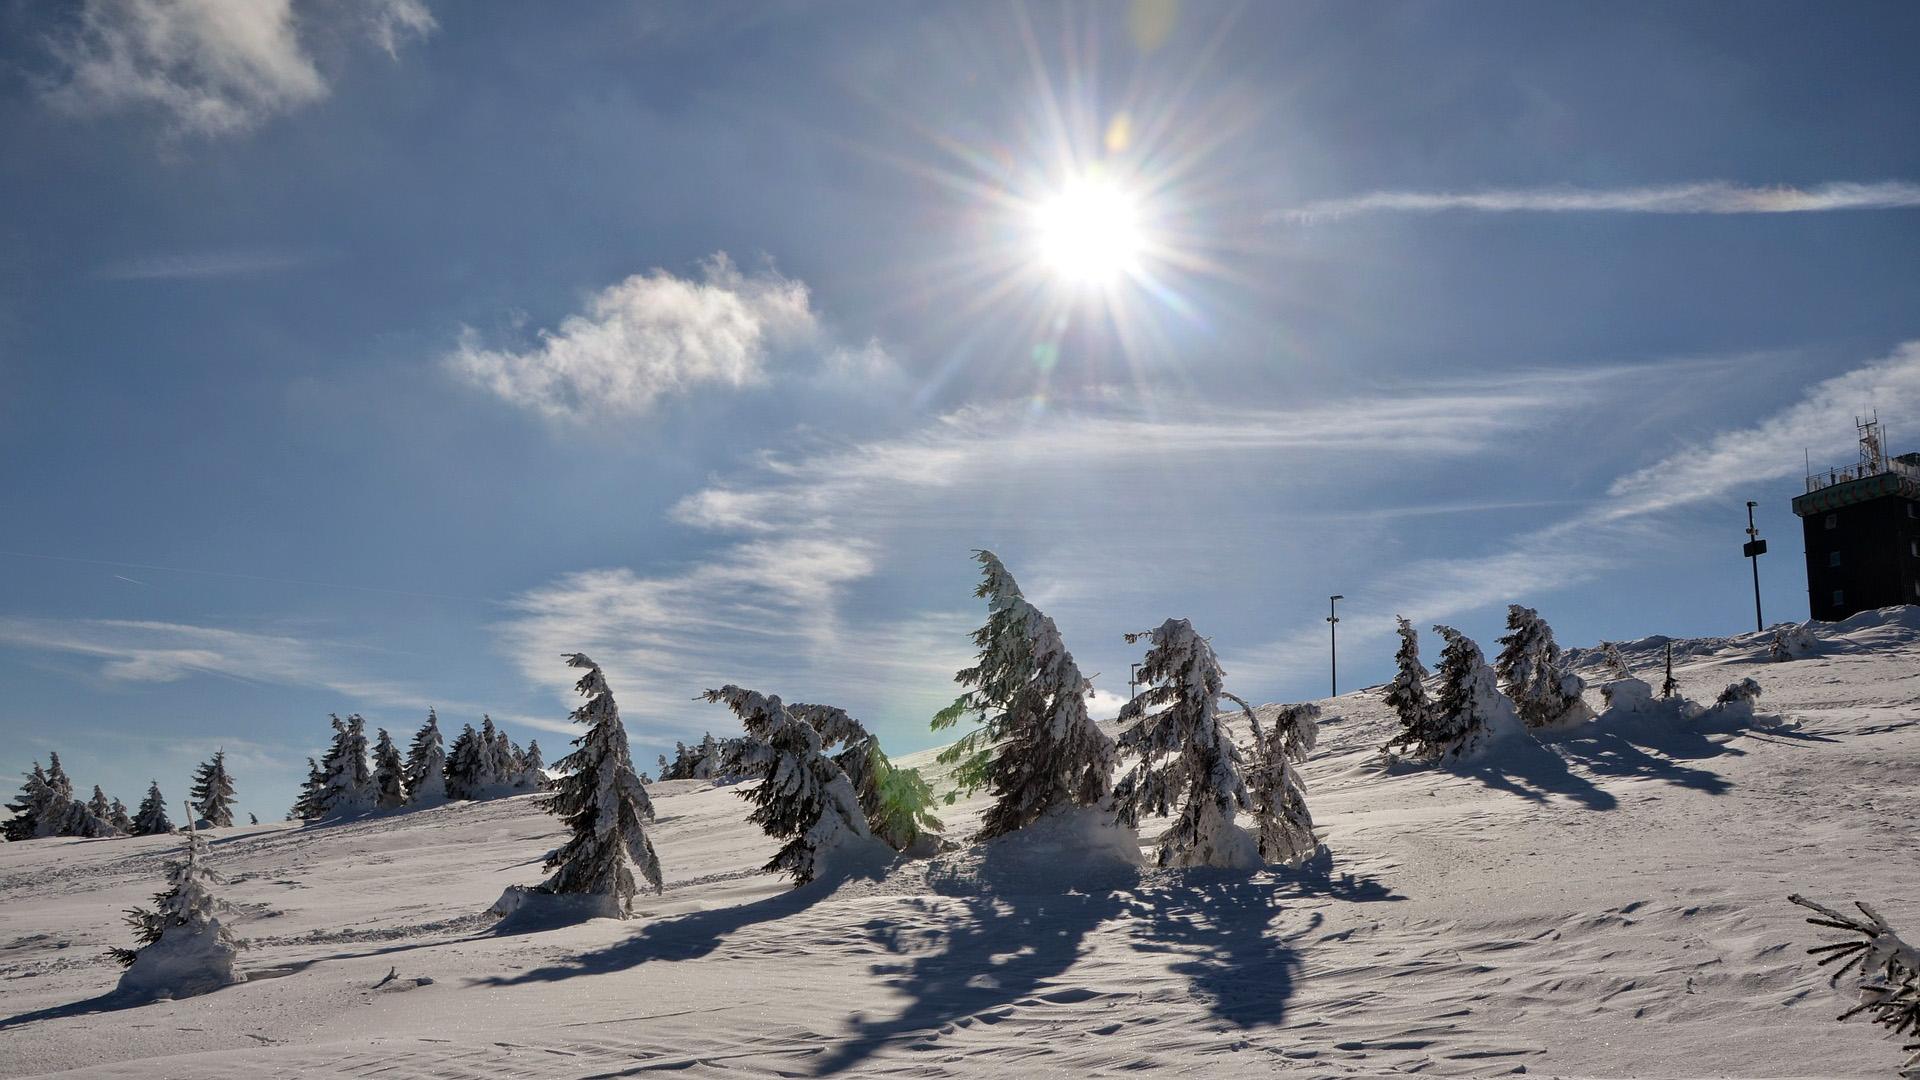 Blockhaus Bodefall - Winter - Bäume im Schnee